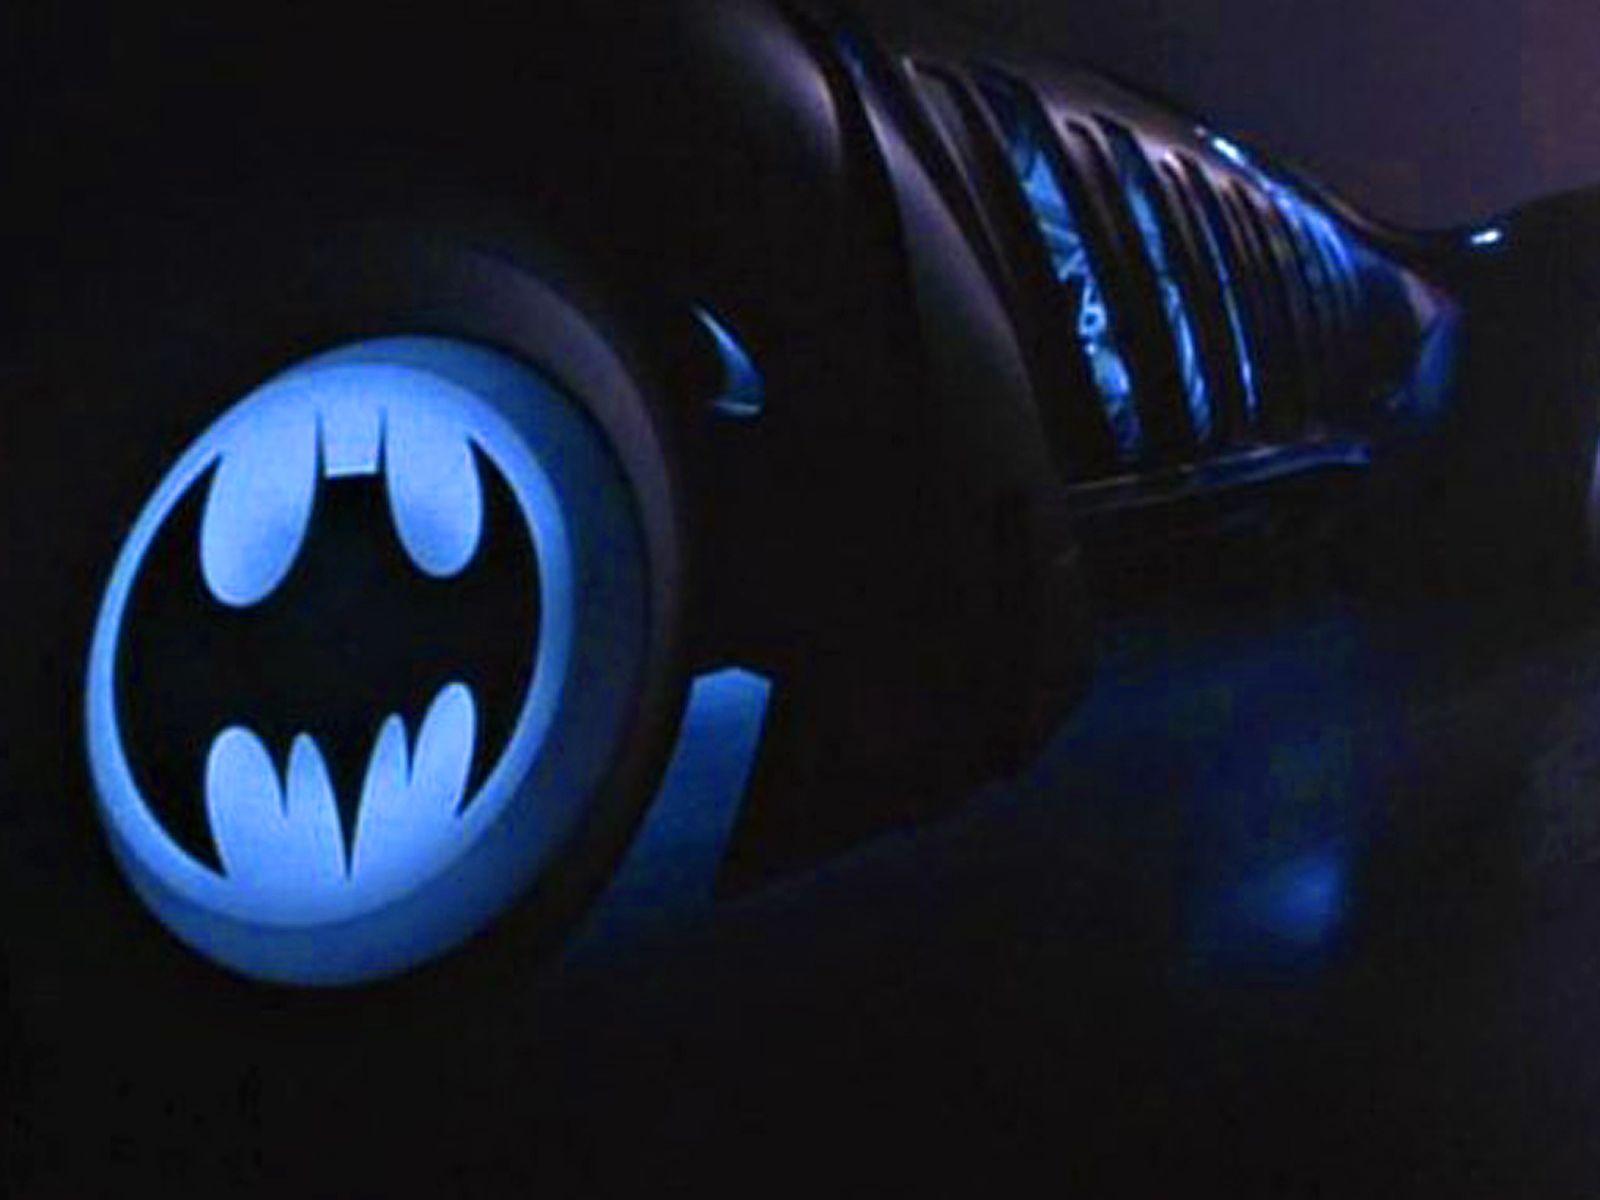 Batman Logo On Batmobile Wheels Wallpaper 1600x1200